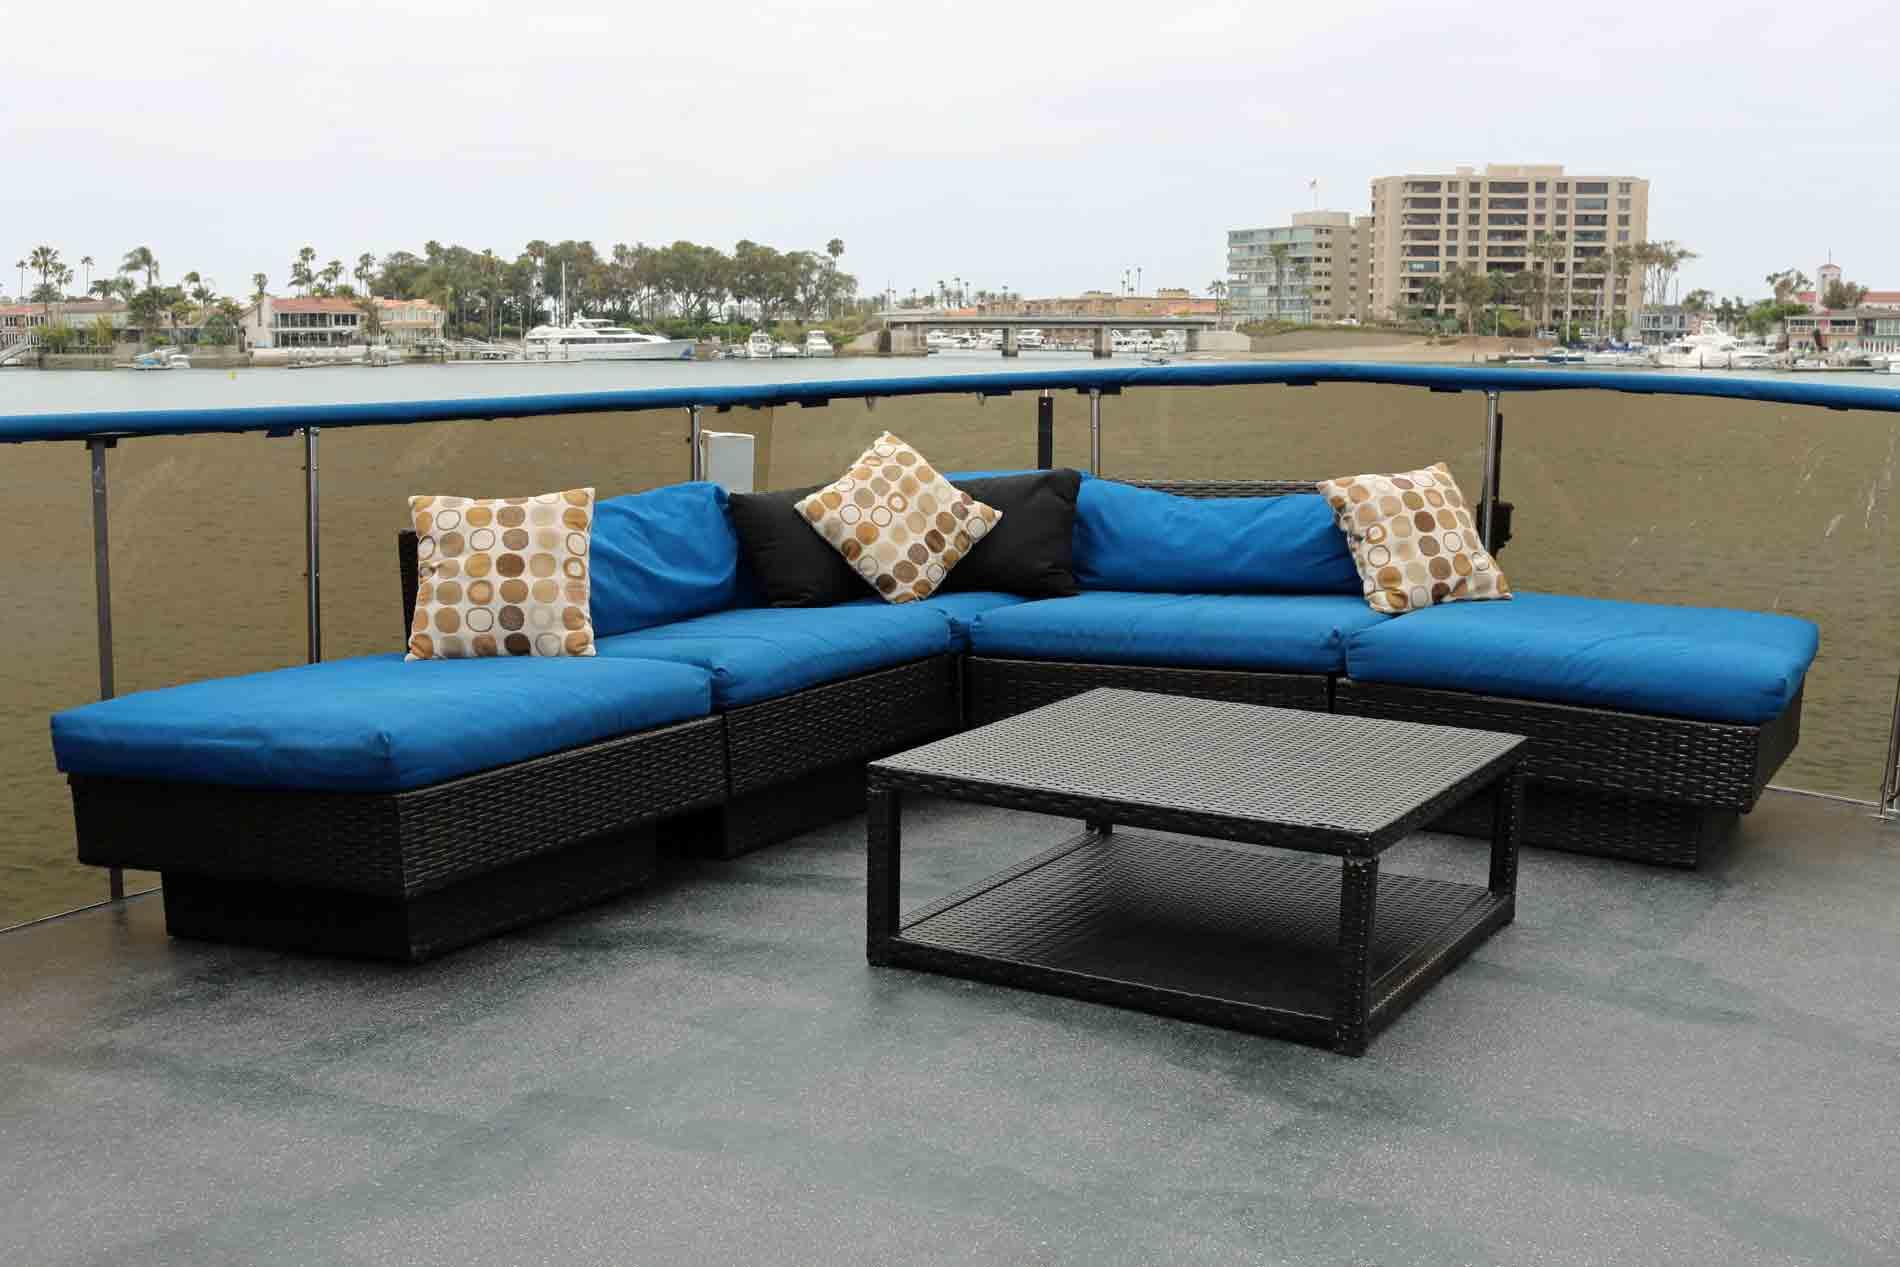 newport beach party yacht deck lounge